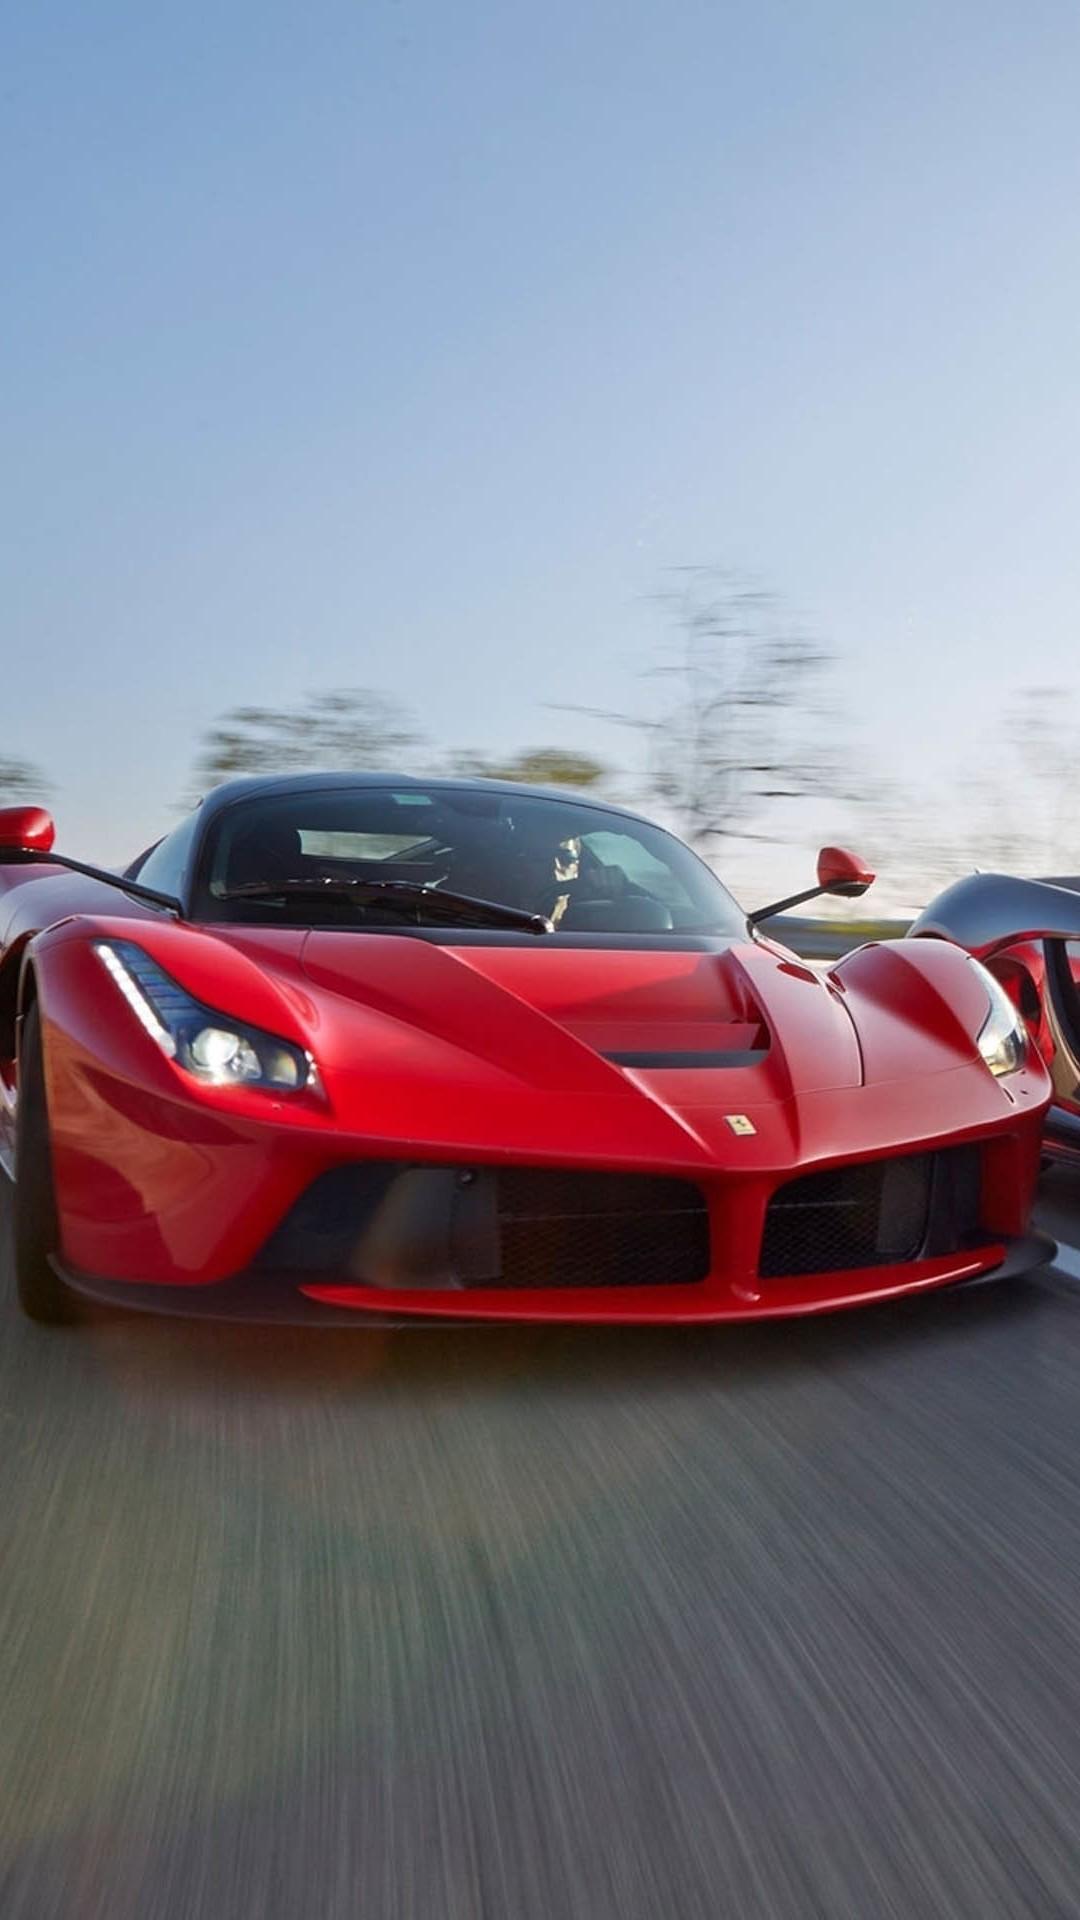 Fast Cool Cars - Ferrari Laferrari Hd Iphone - 1080x1920 ...